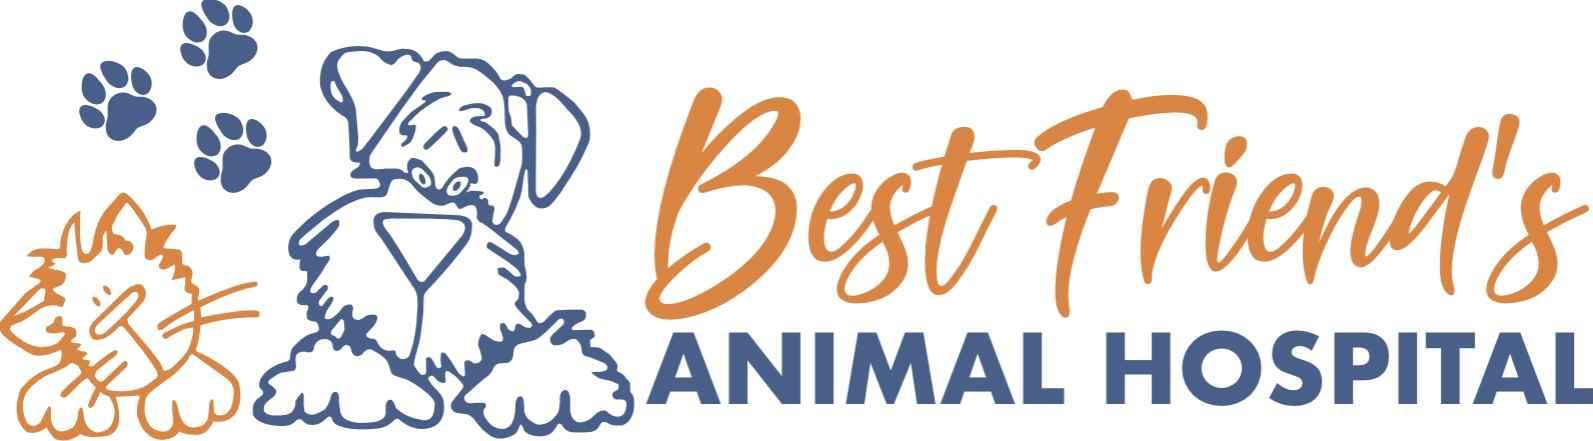 Best Friend's Animal Hospital